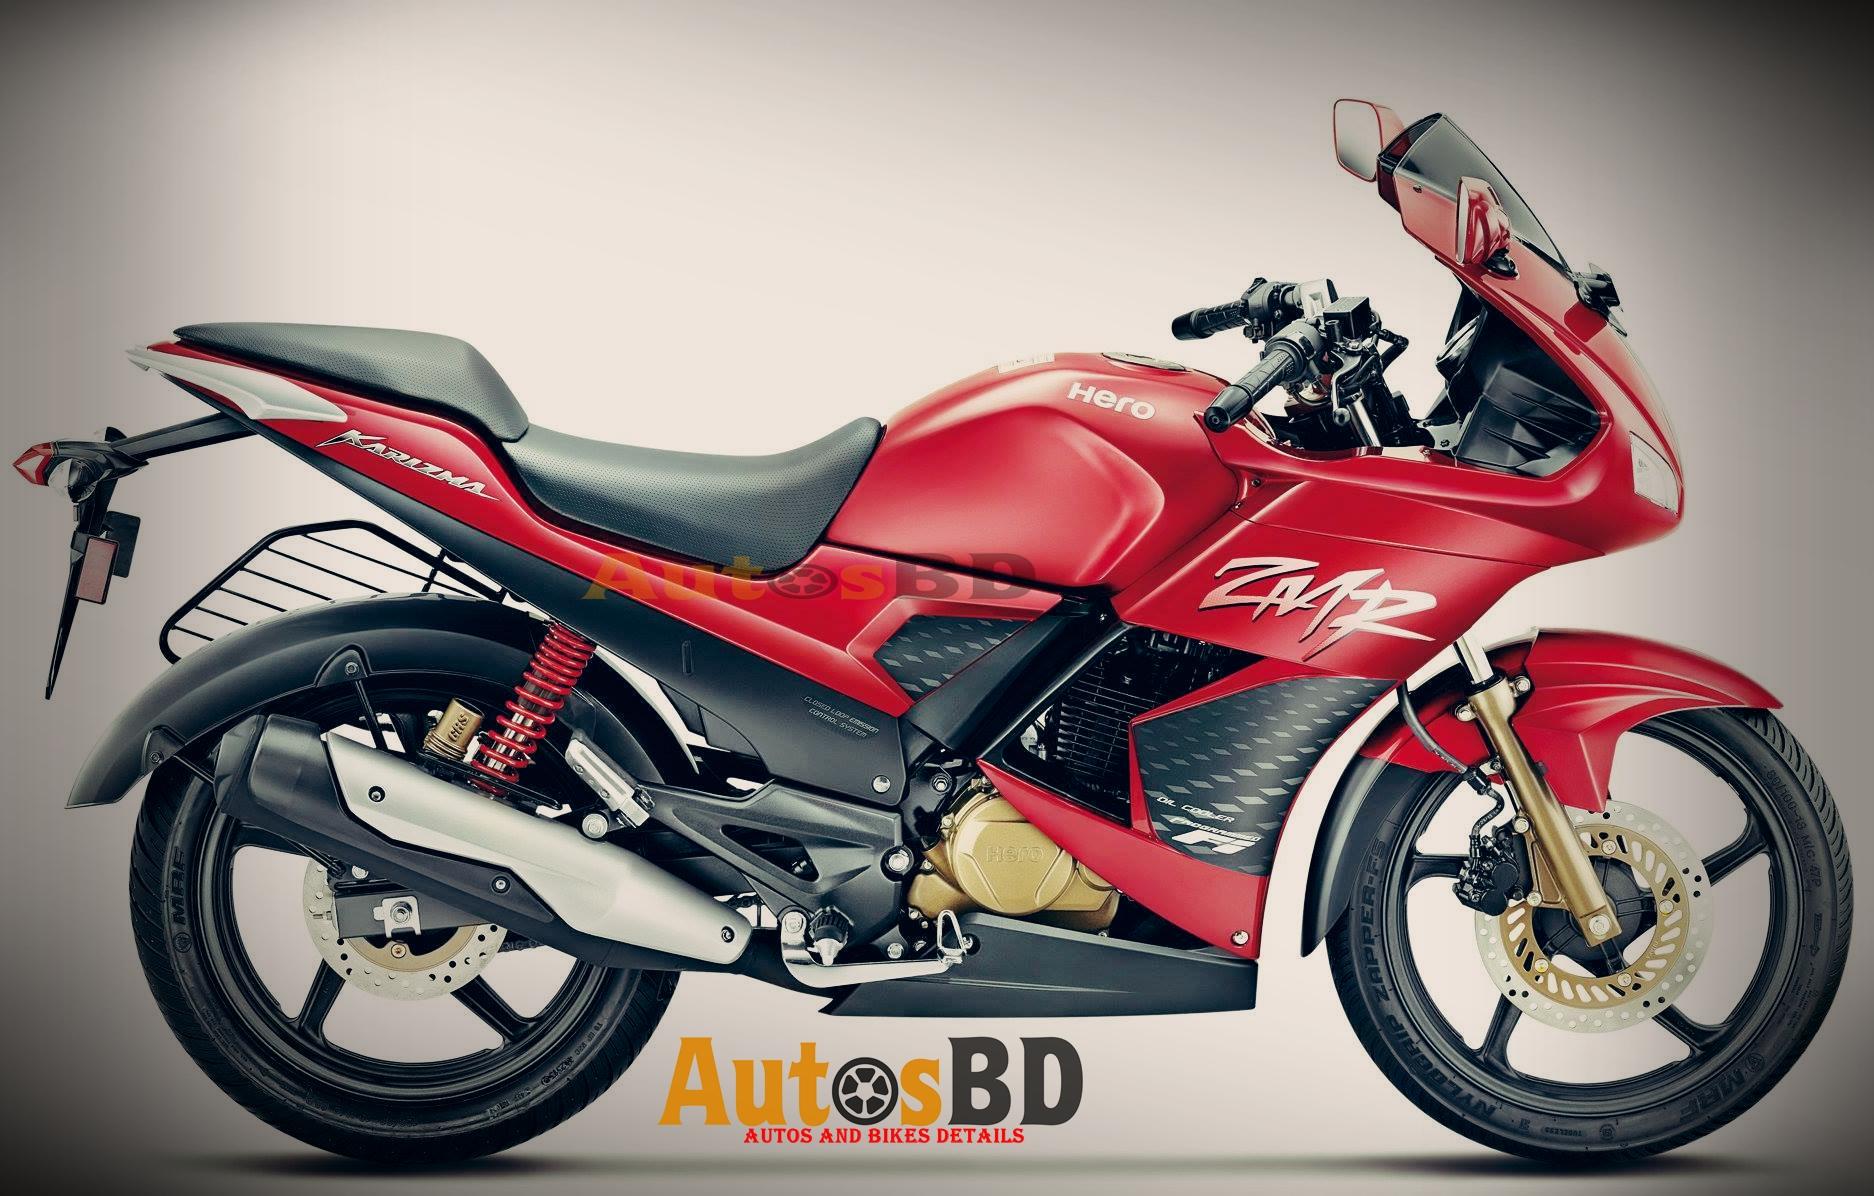 Hero Karizma ZMR Version 2.0 Motorcycle Specification